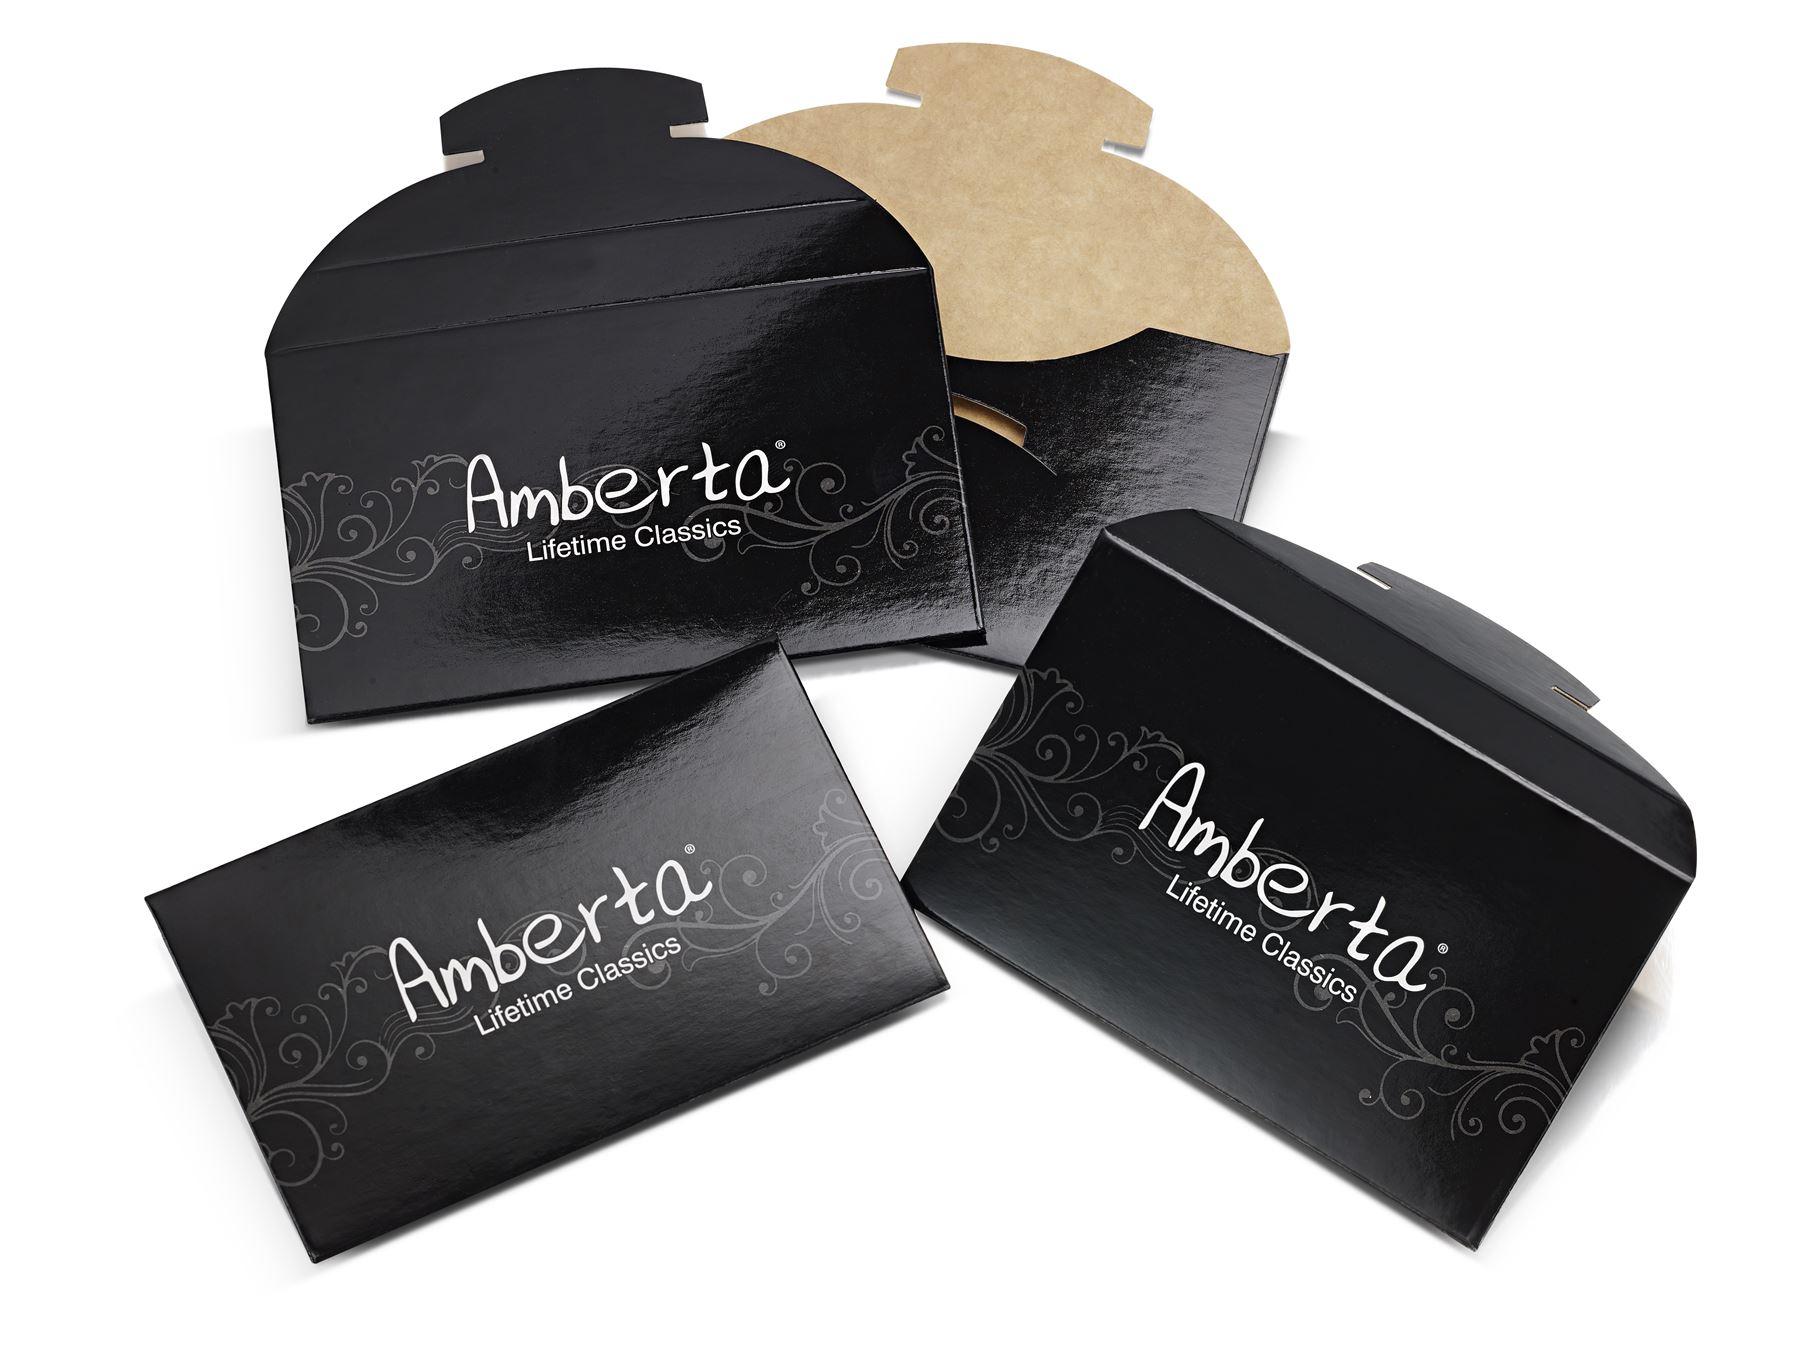 Amberta-Jewelry-925-Sterling-Silver-Adjustable-Bracelet-Italian-Bangle-for-Women miniature 70